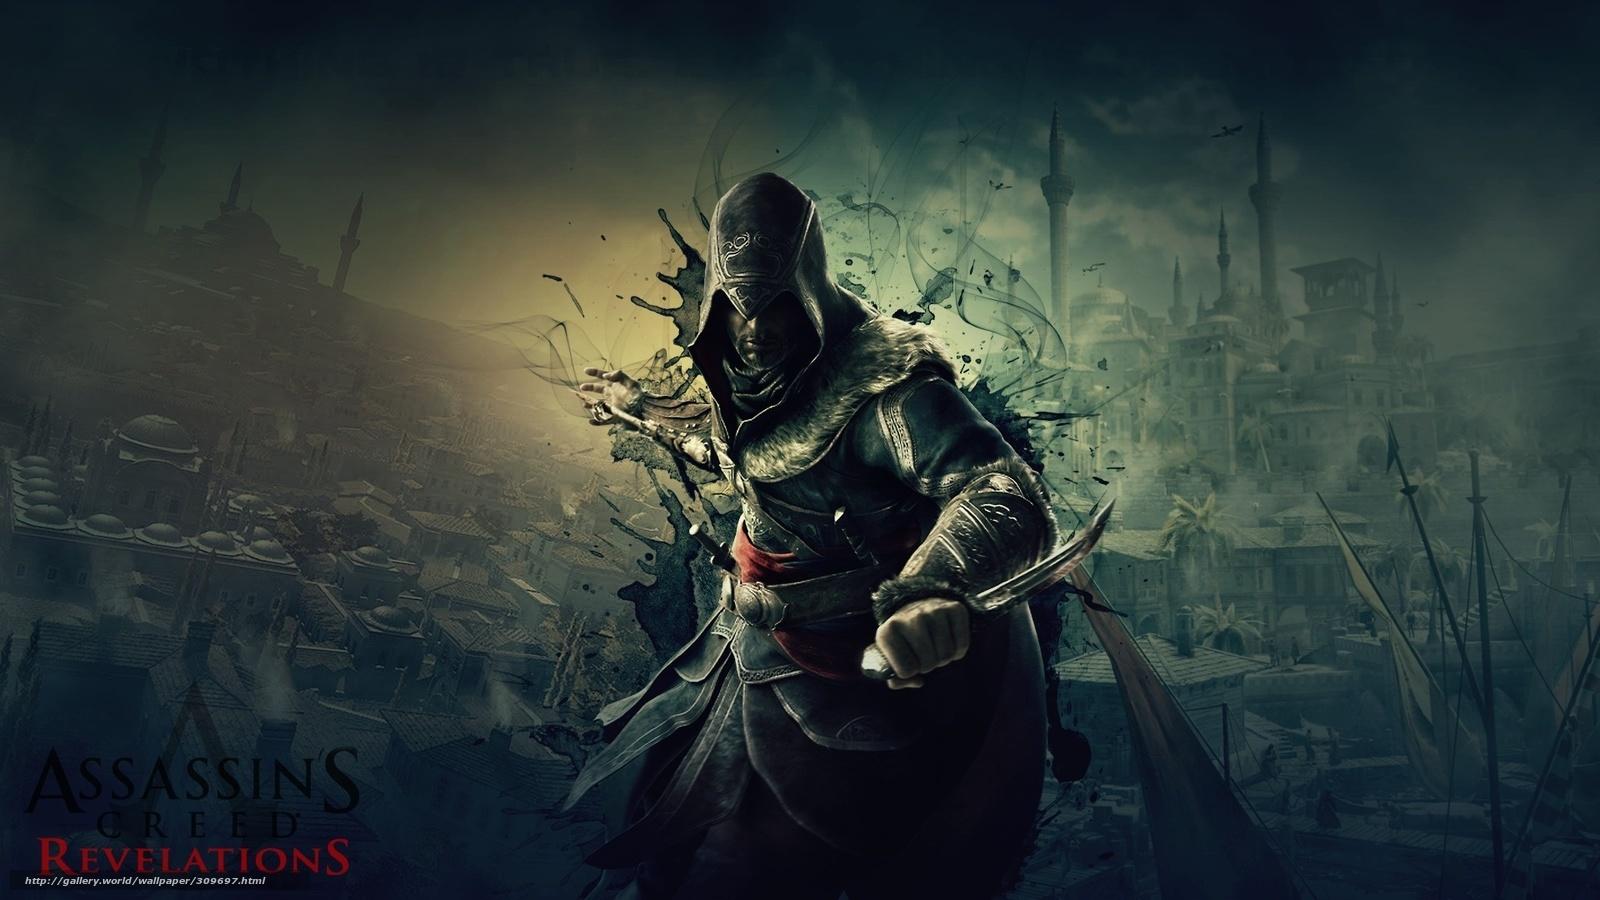 Assassins Creed Wallpaper 1080p: 1080p Wallpaper Here